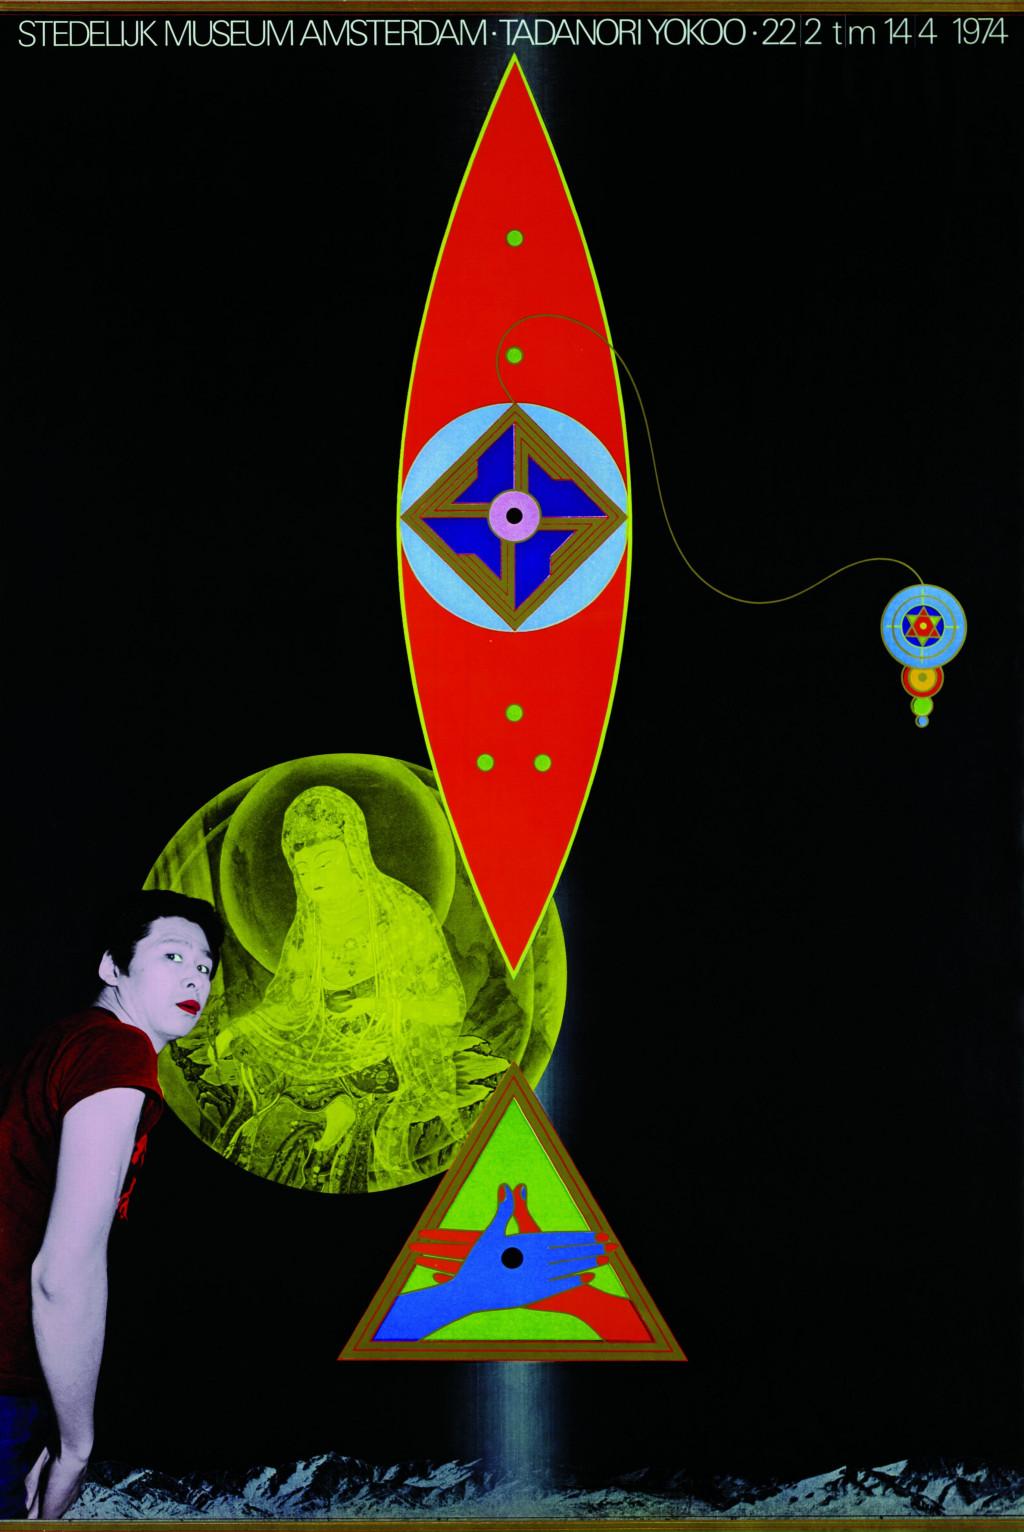 Tadanori Yokoo and Will van Sambeek, 'Tadanori Yokoo', 1974. Collection Stedelijk Museum Amsterdam